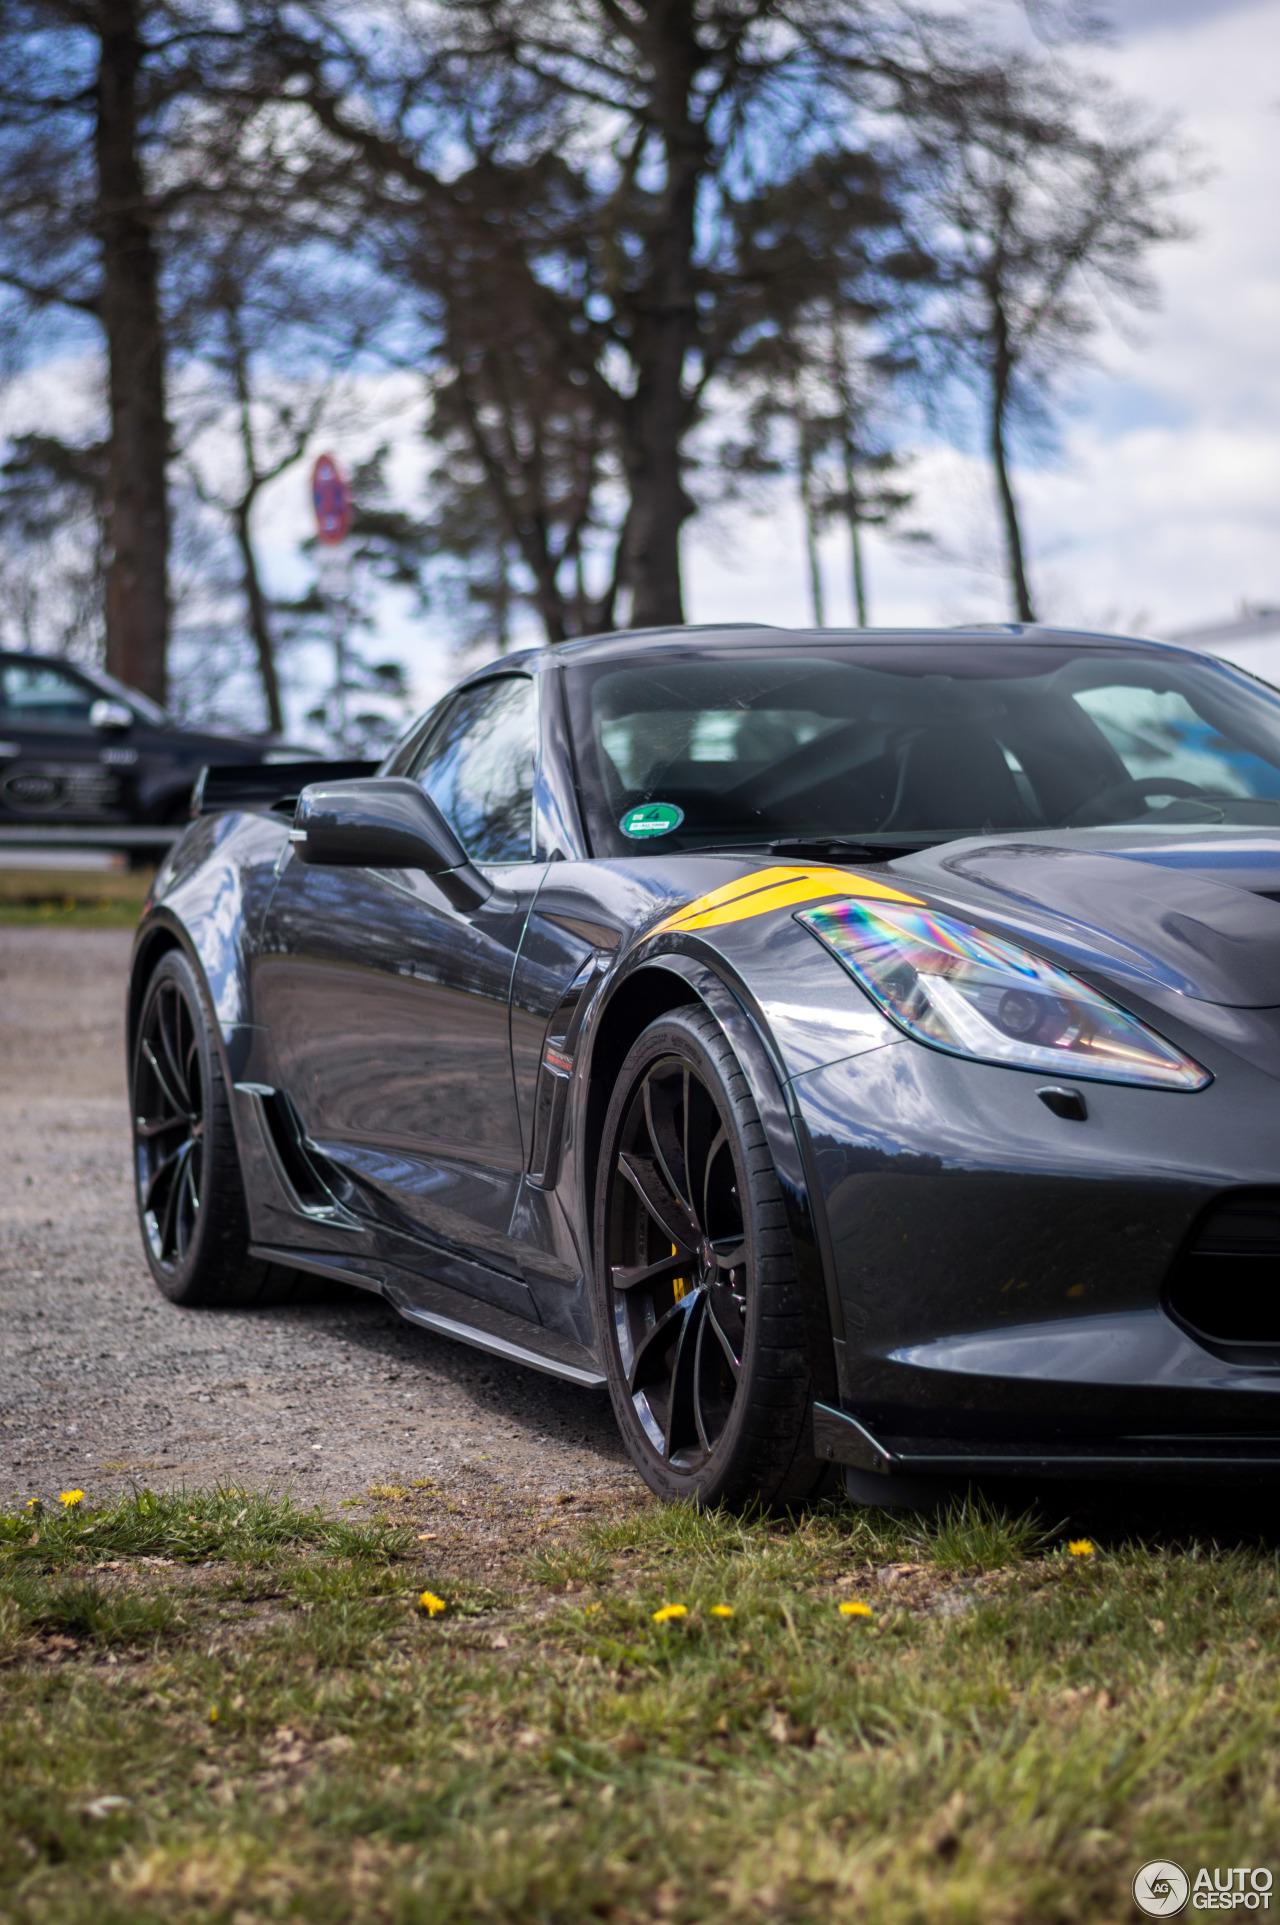 Chevrolet Corvette C7 Grand Sport 3 May 2017 Autogespot